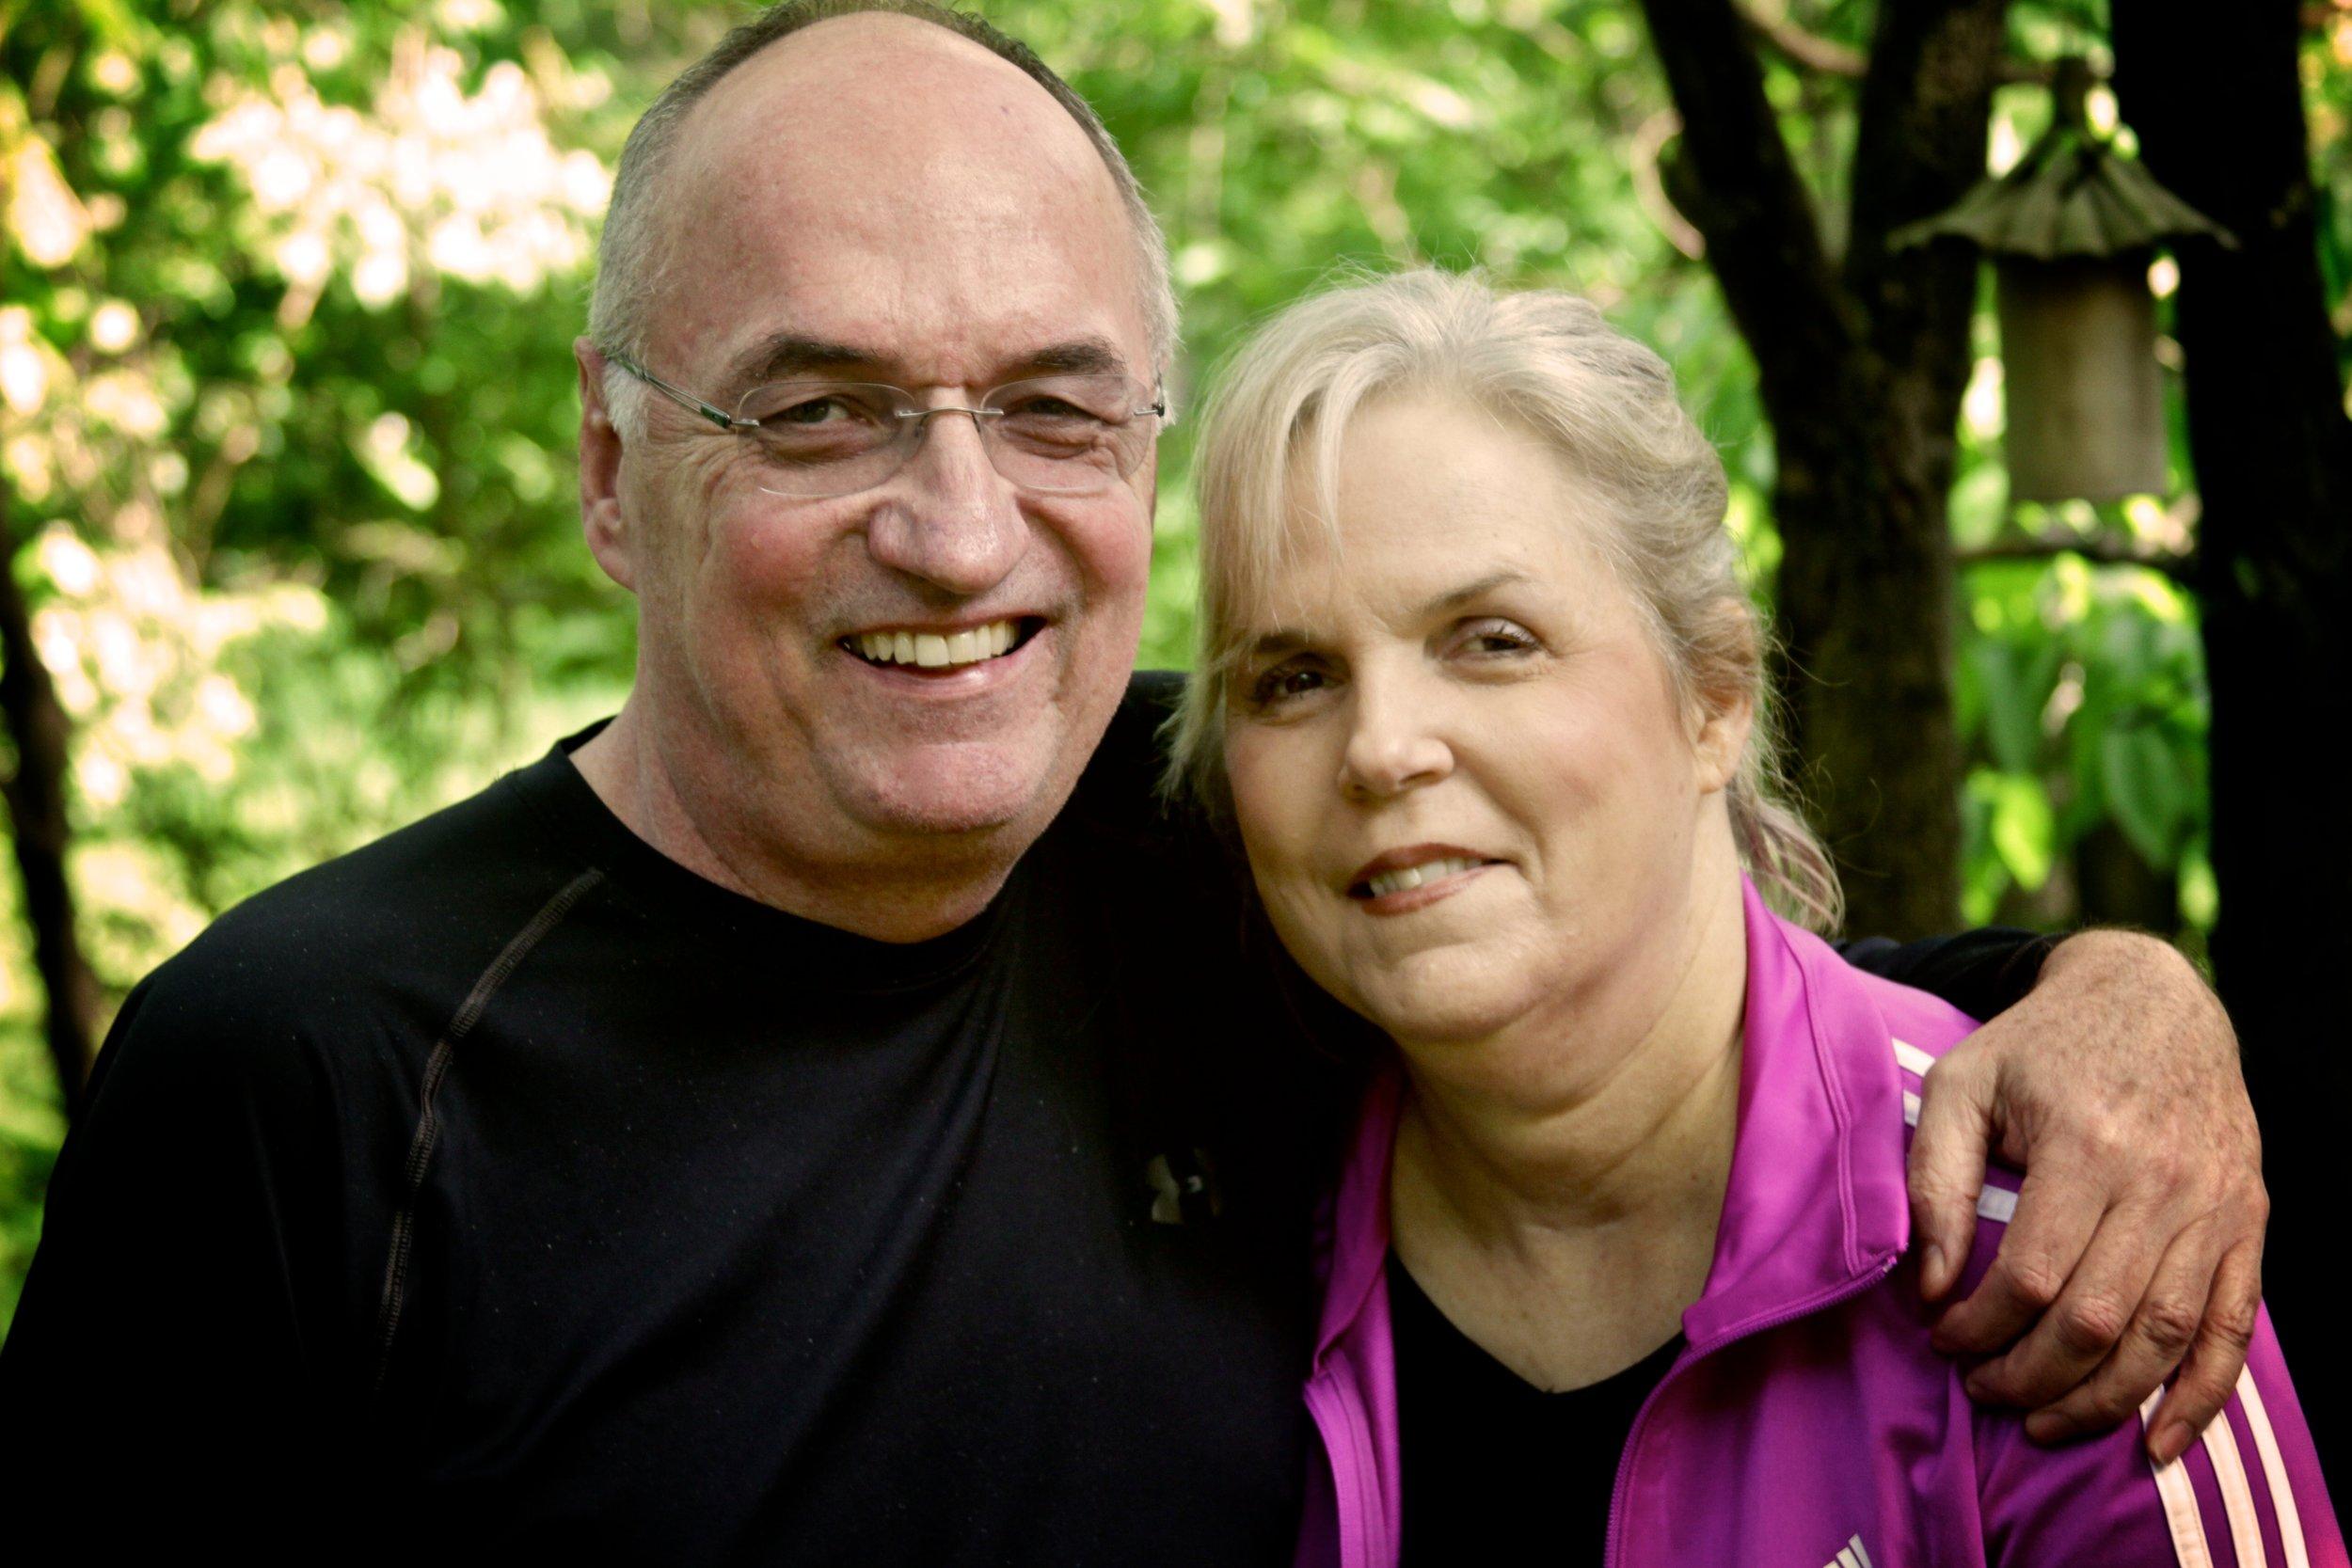 Carol Wall & Dick Wall in 2012 - Photo Credit: Phil Wall